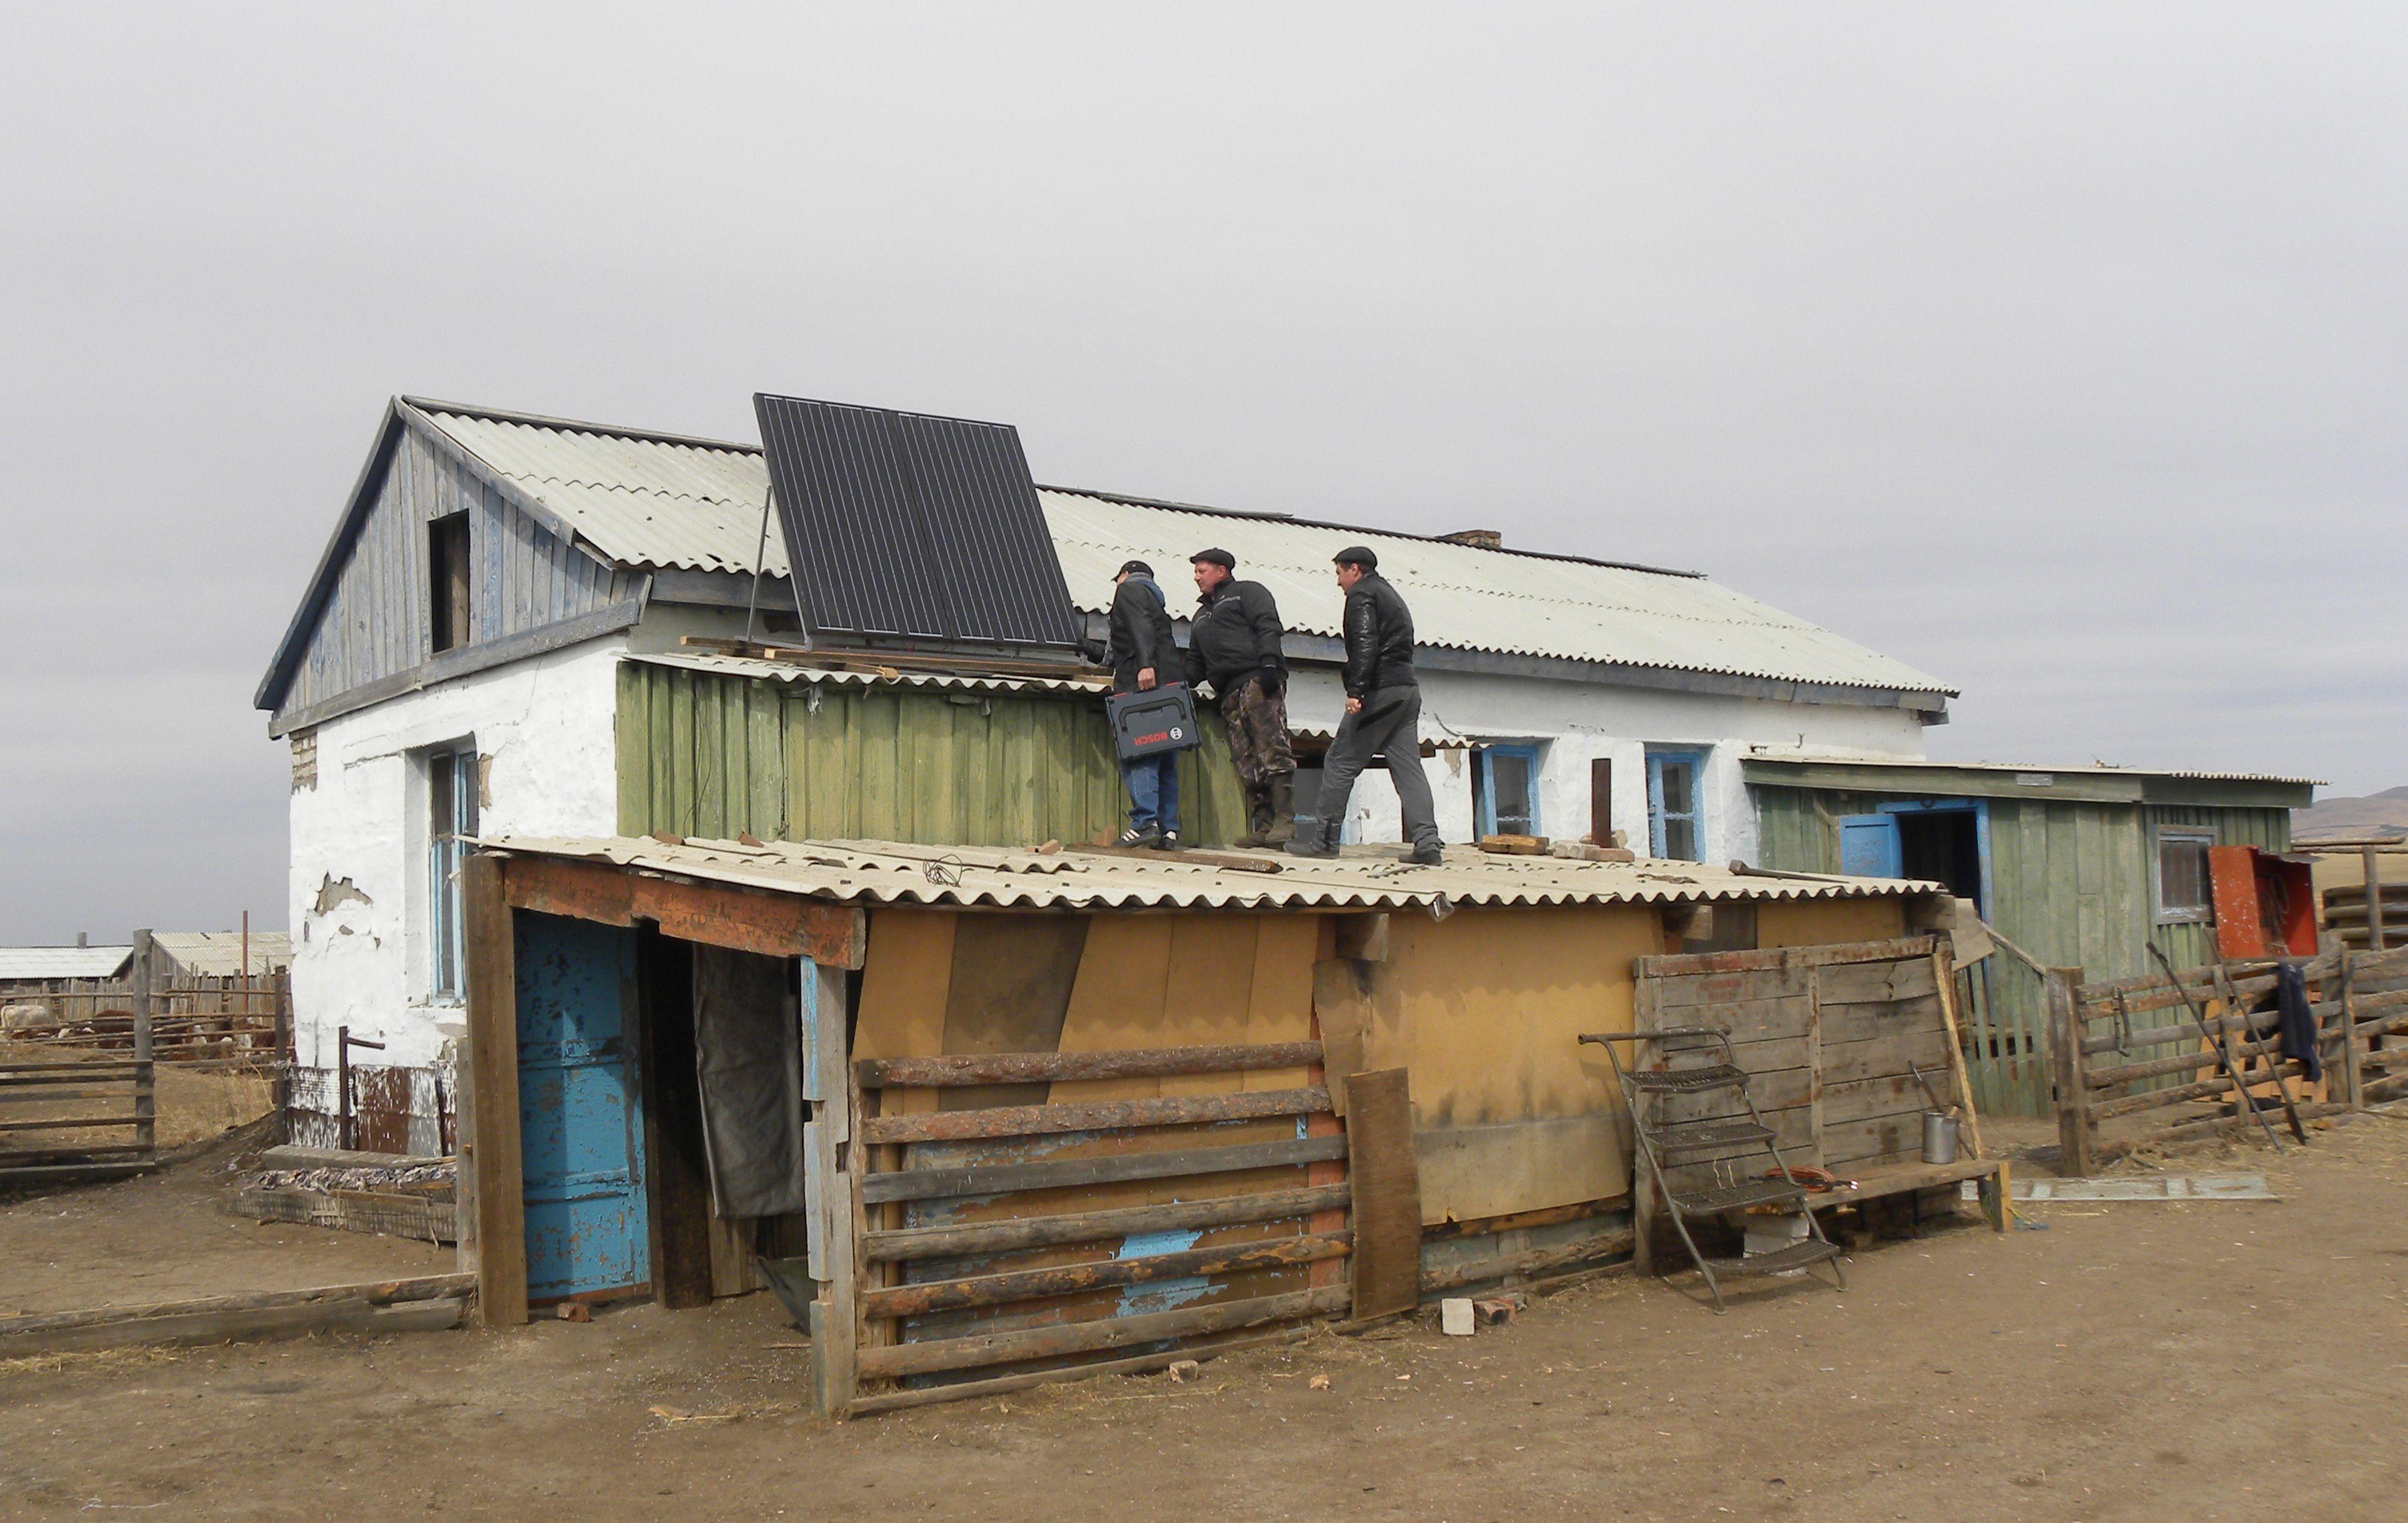 c. Хада-Булак автономная станция